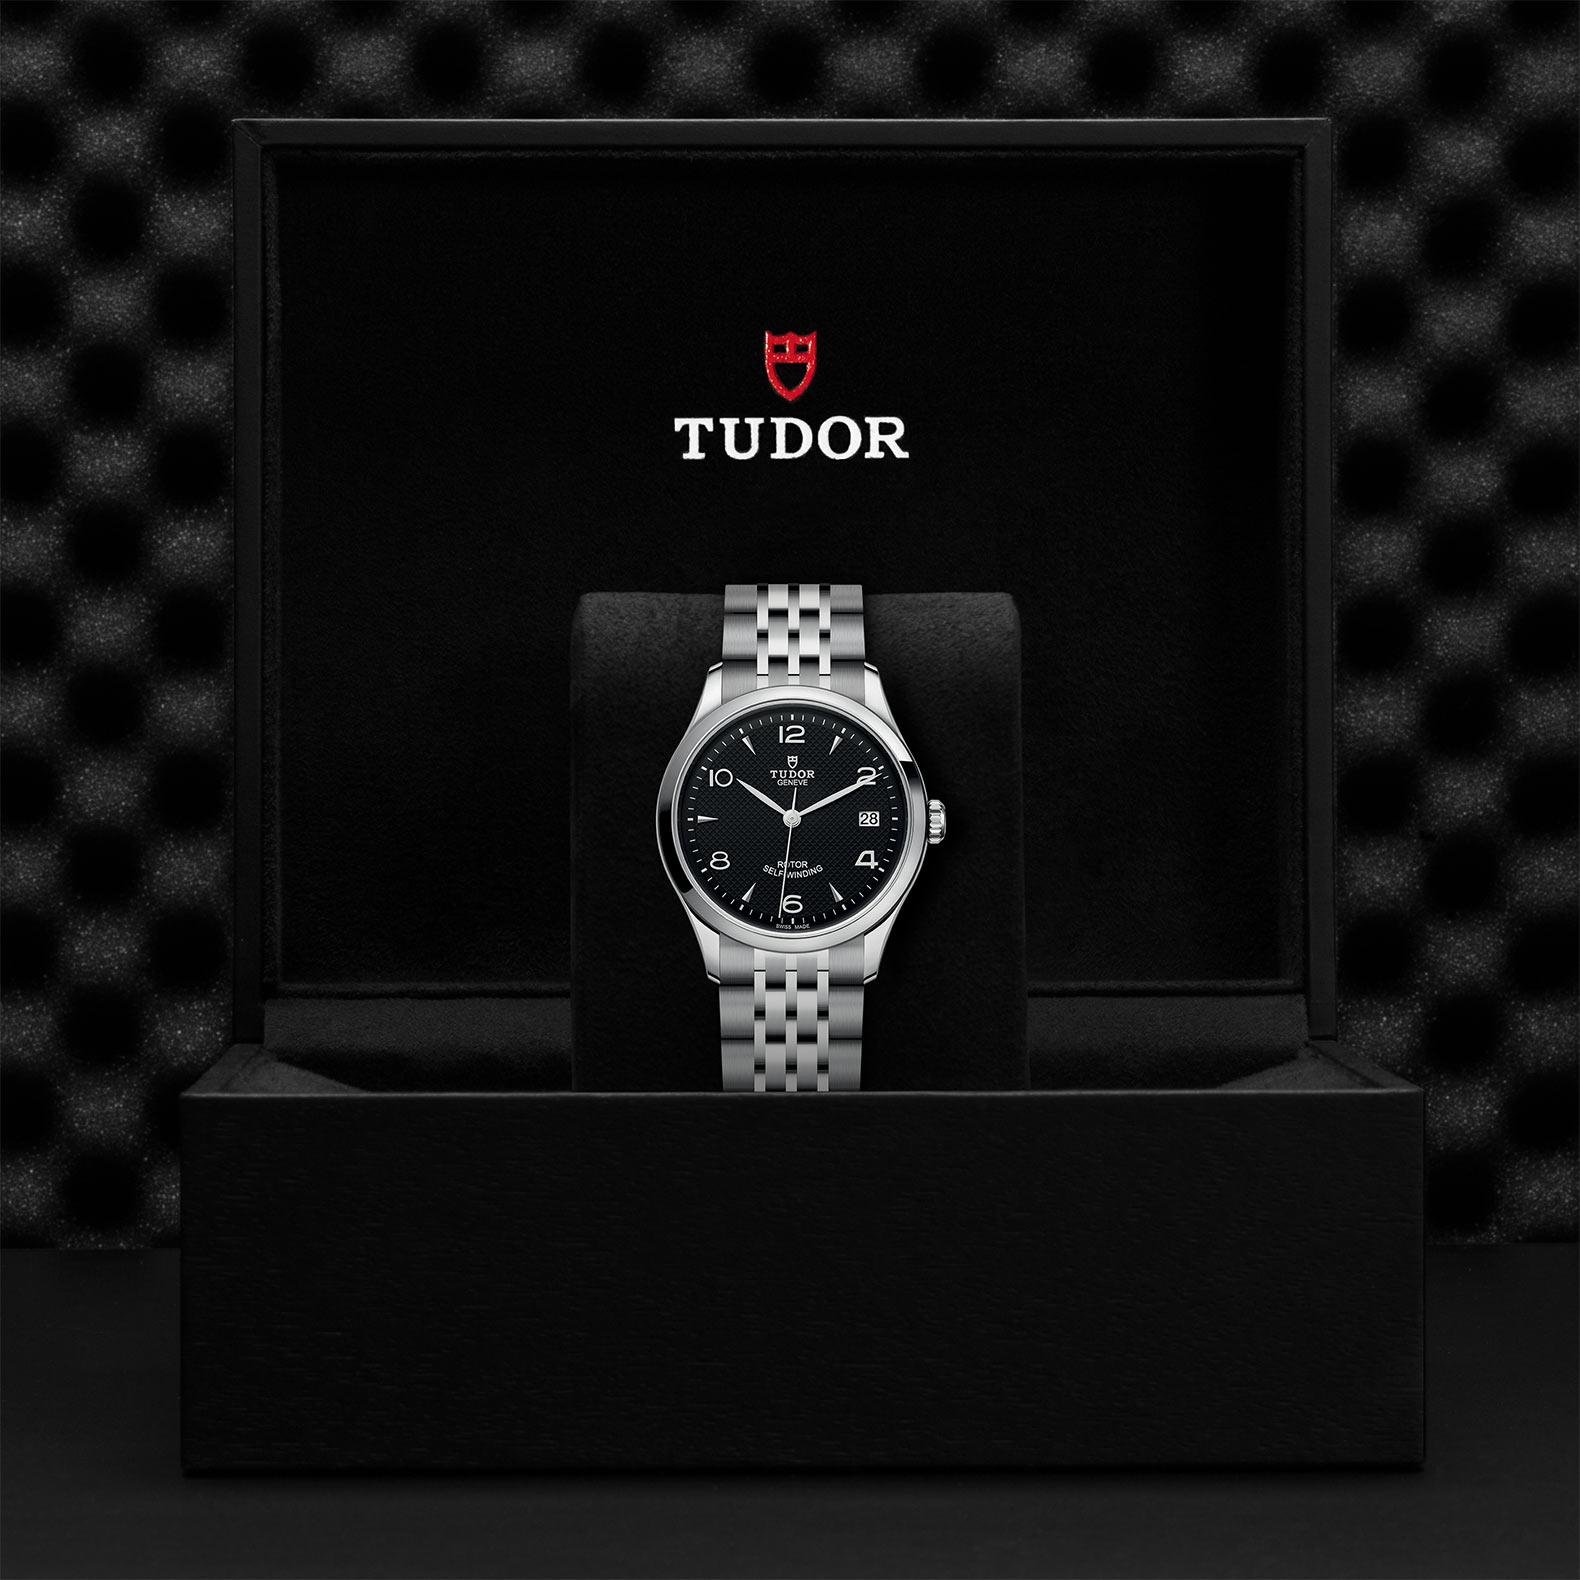 Tudor_M91450-0002